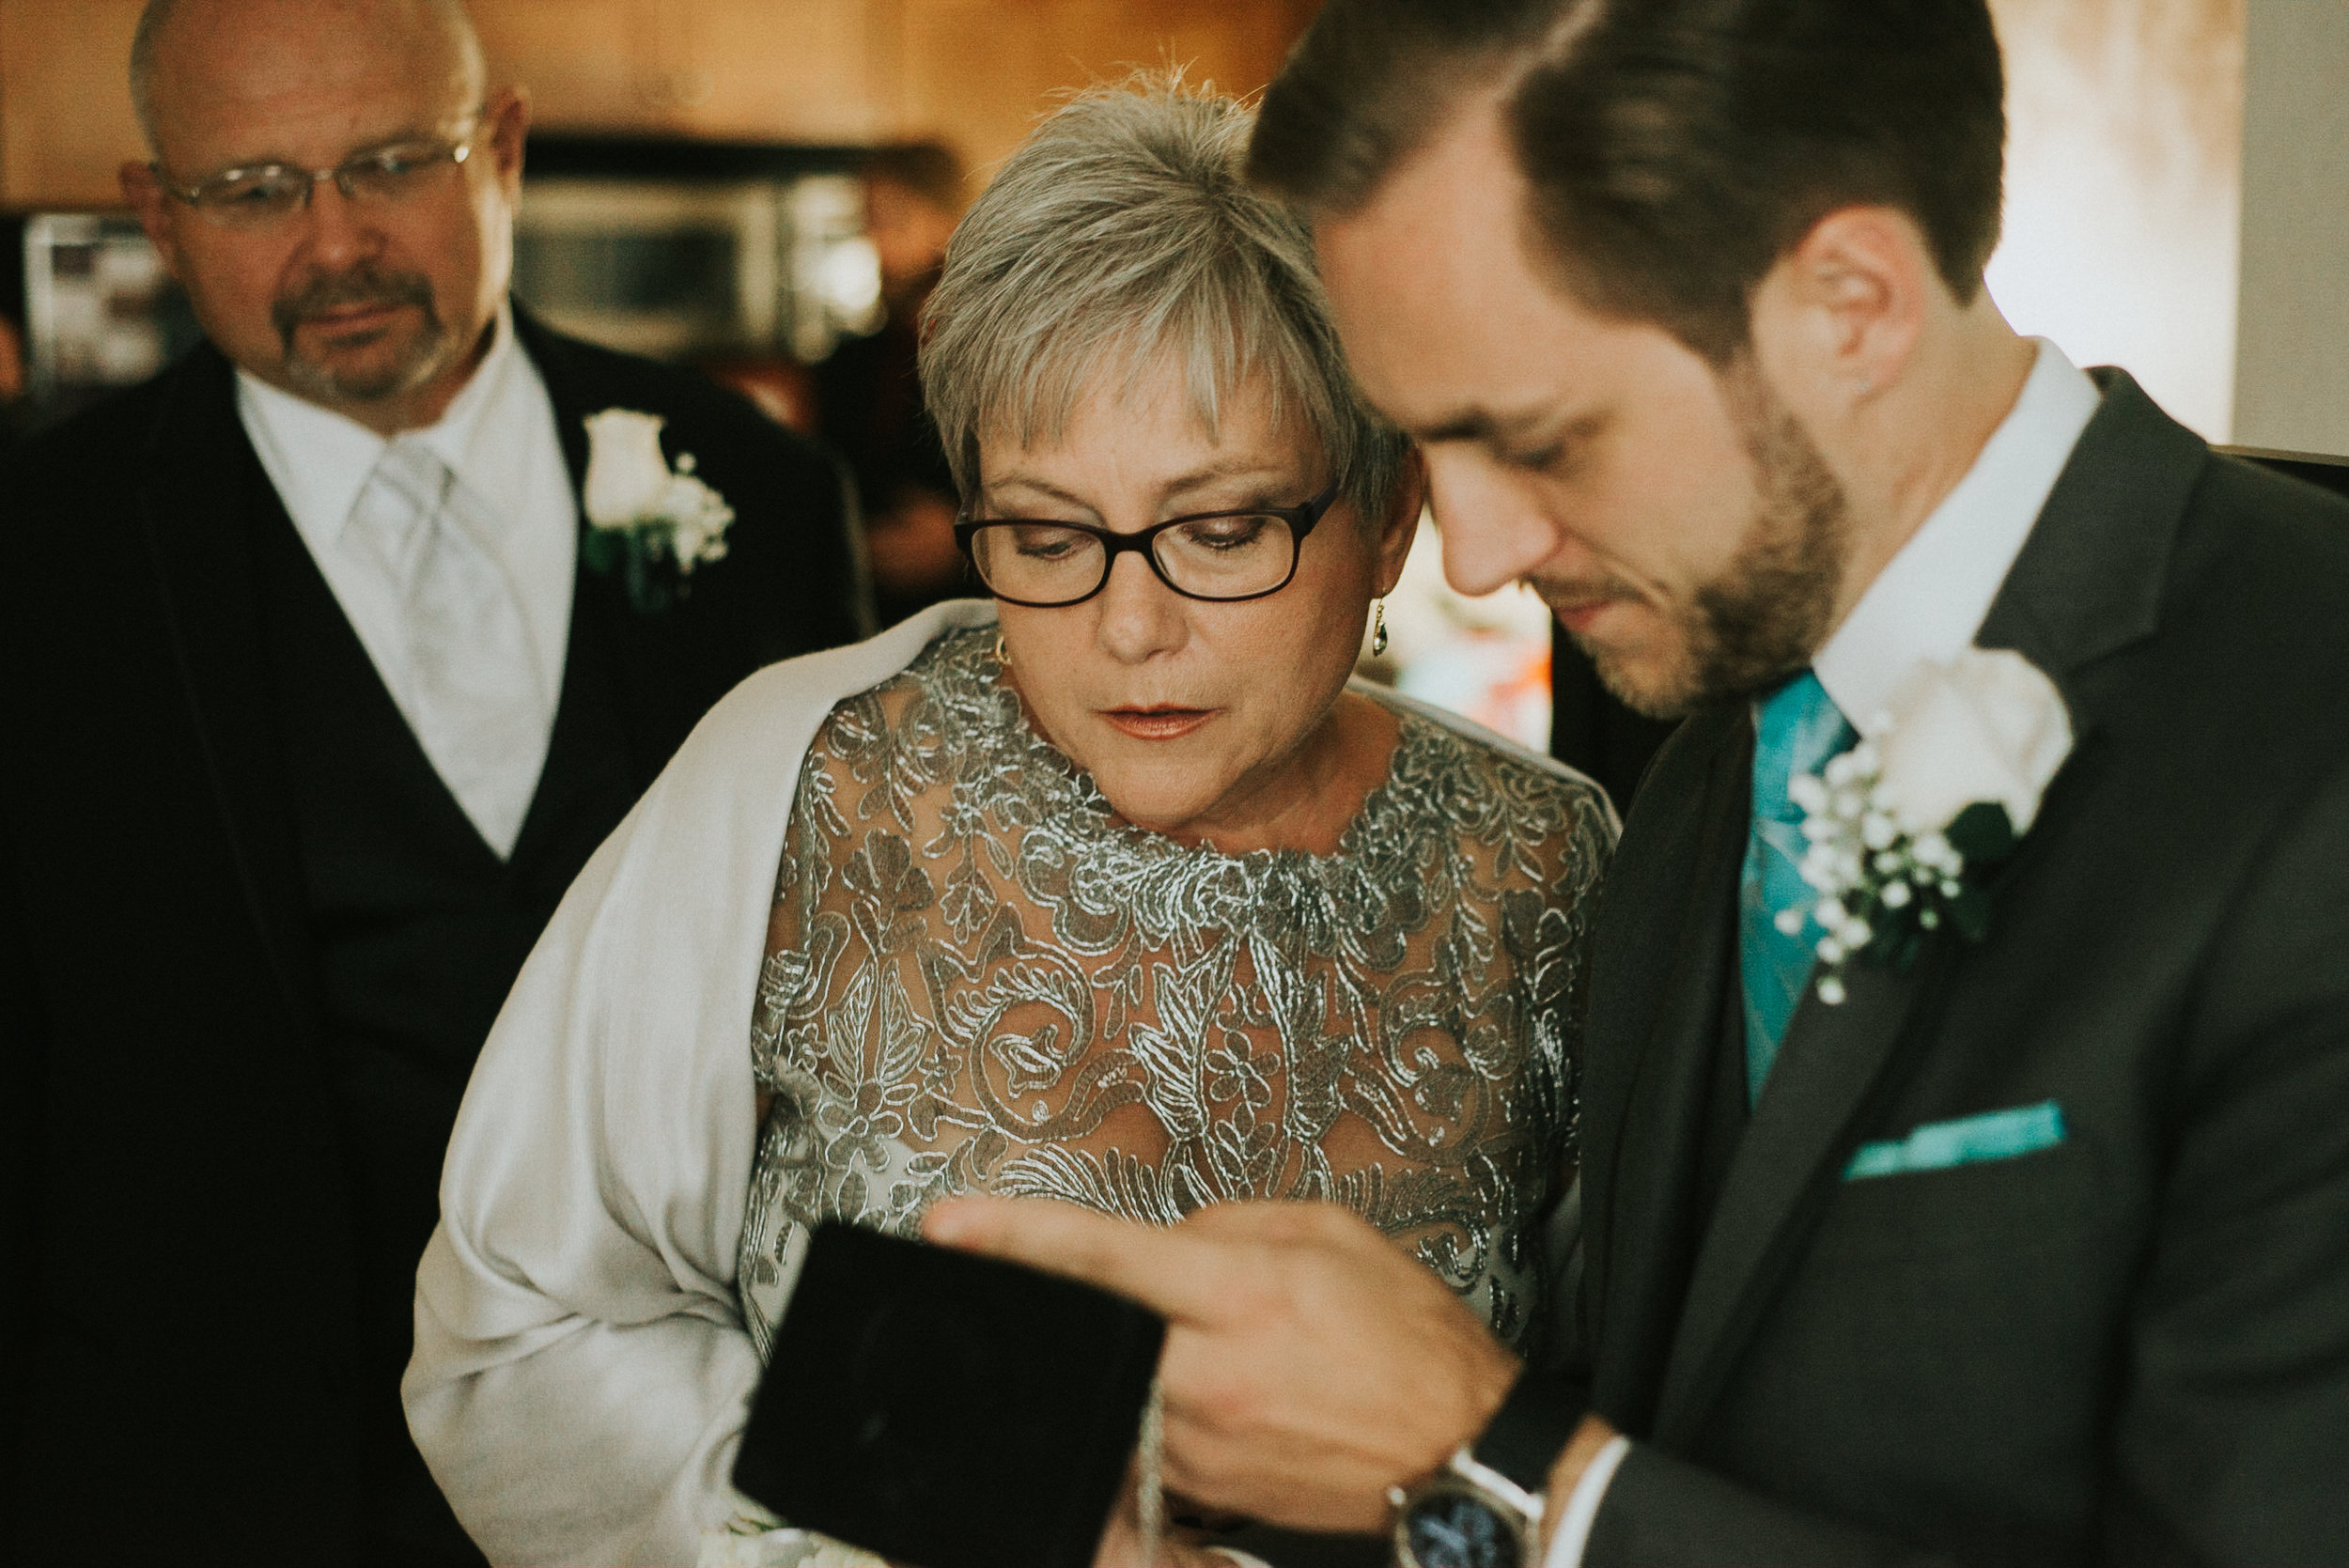 Tiana-and-Danny-Wedding-44.jpg